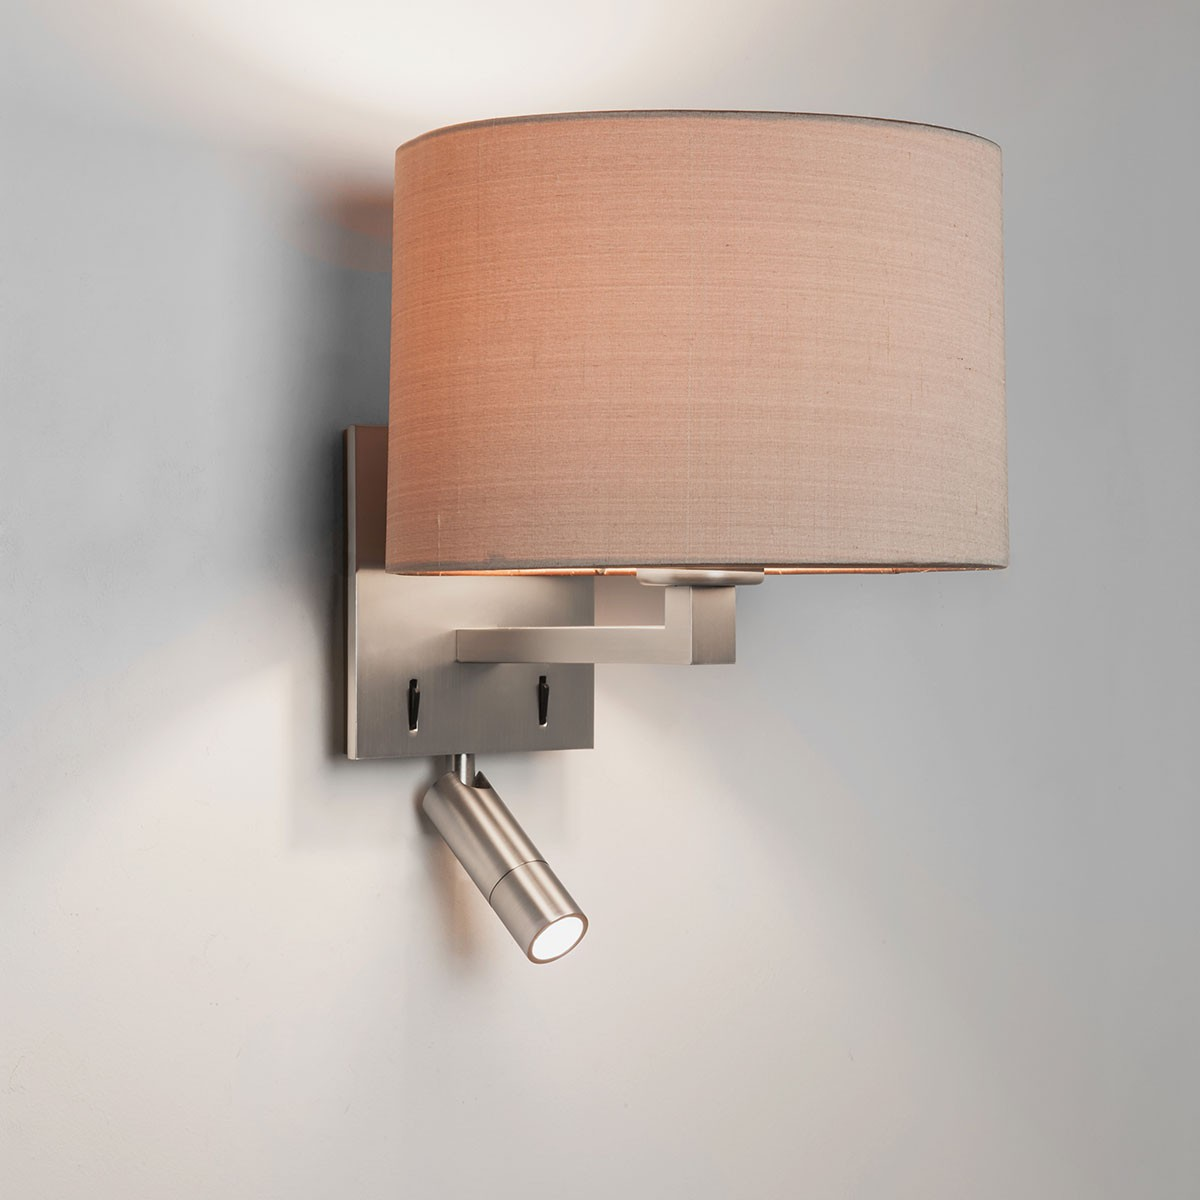 Astro Azumi Reader Matt Nickel Wall Light with LED Reading Light at UK Electrical Supplies.